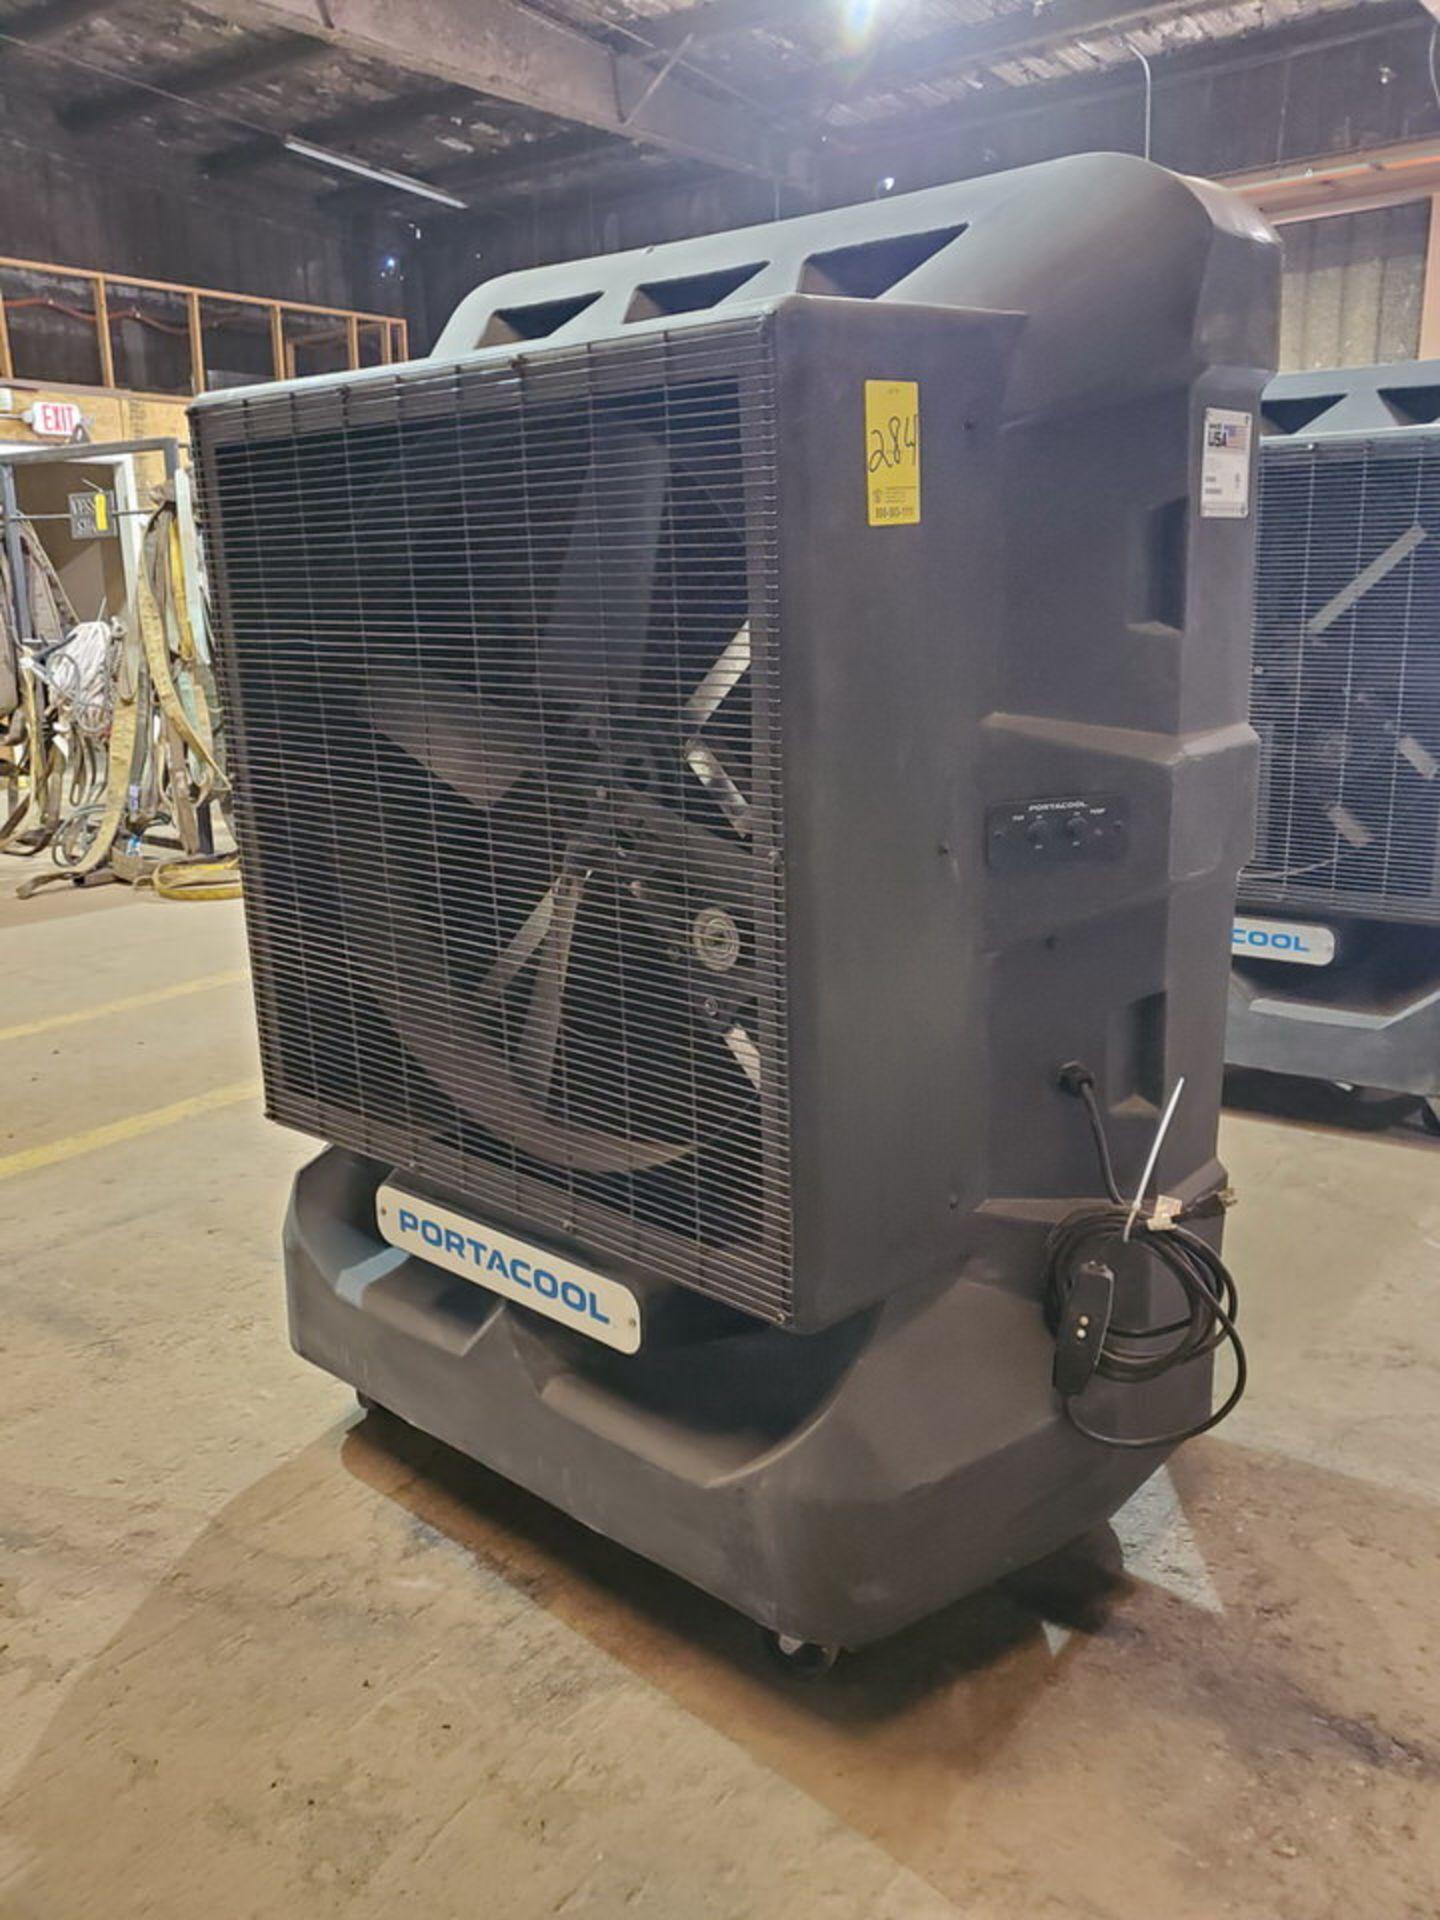 Portacool Cyclone 160 Portable Evaporative Cooler 115V, 60HZ, 7.3A - Image 4 of 7